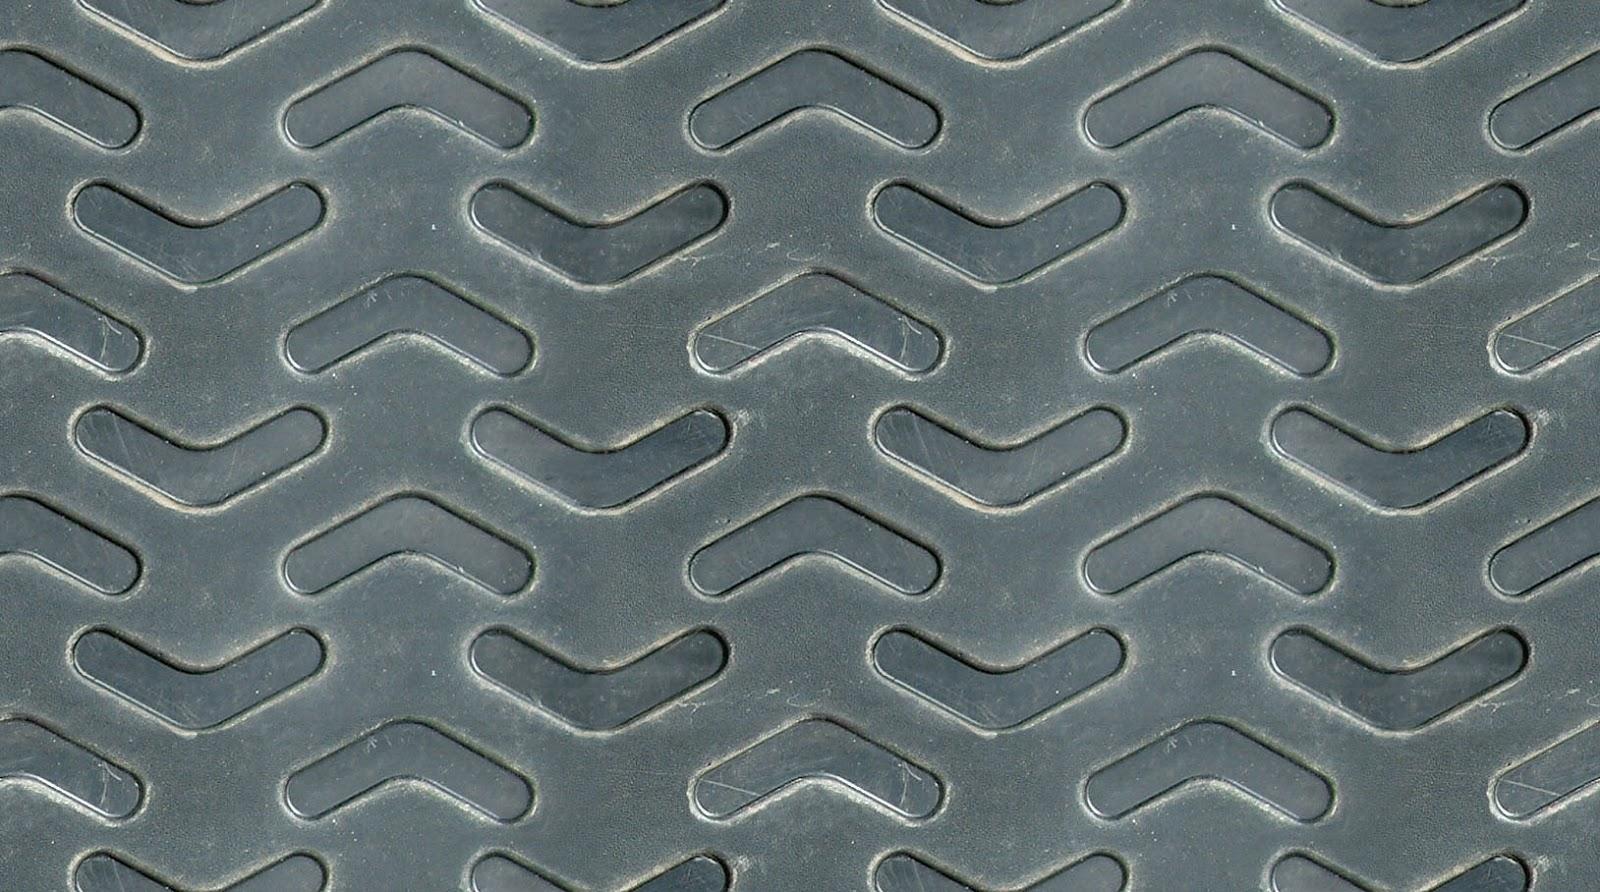 Seamless Metal Plate Texture Maps Texturise Free